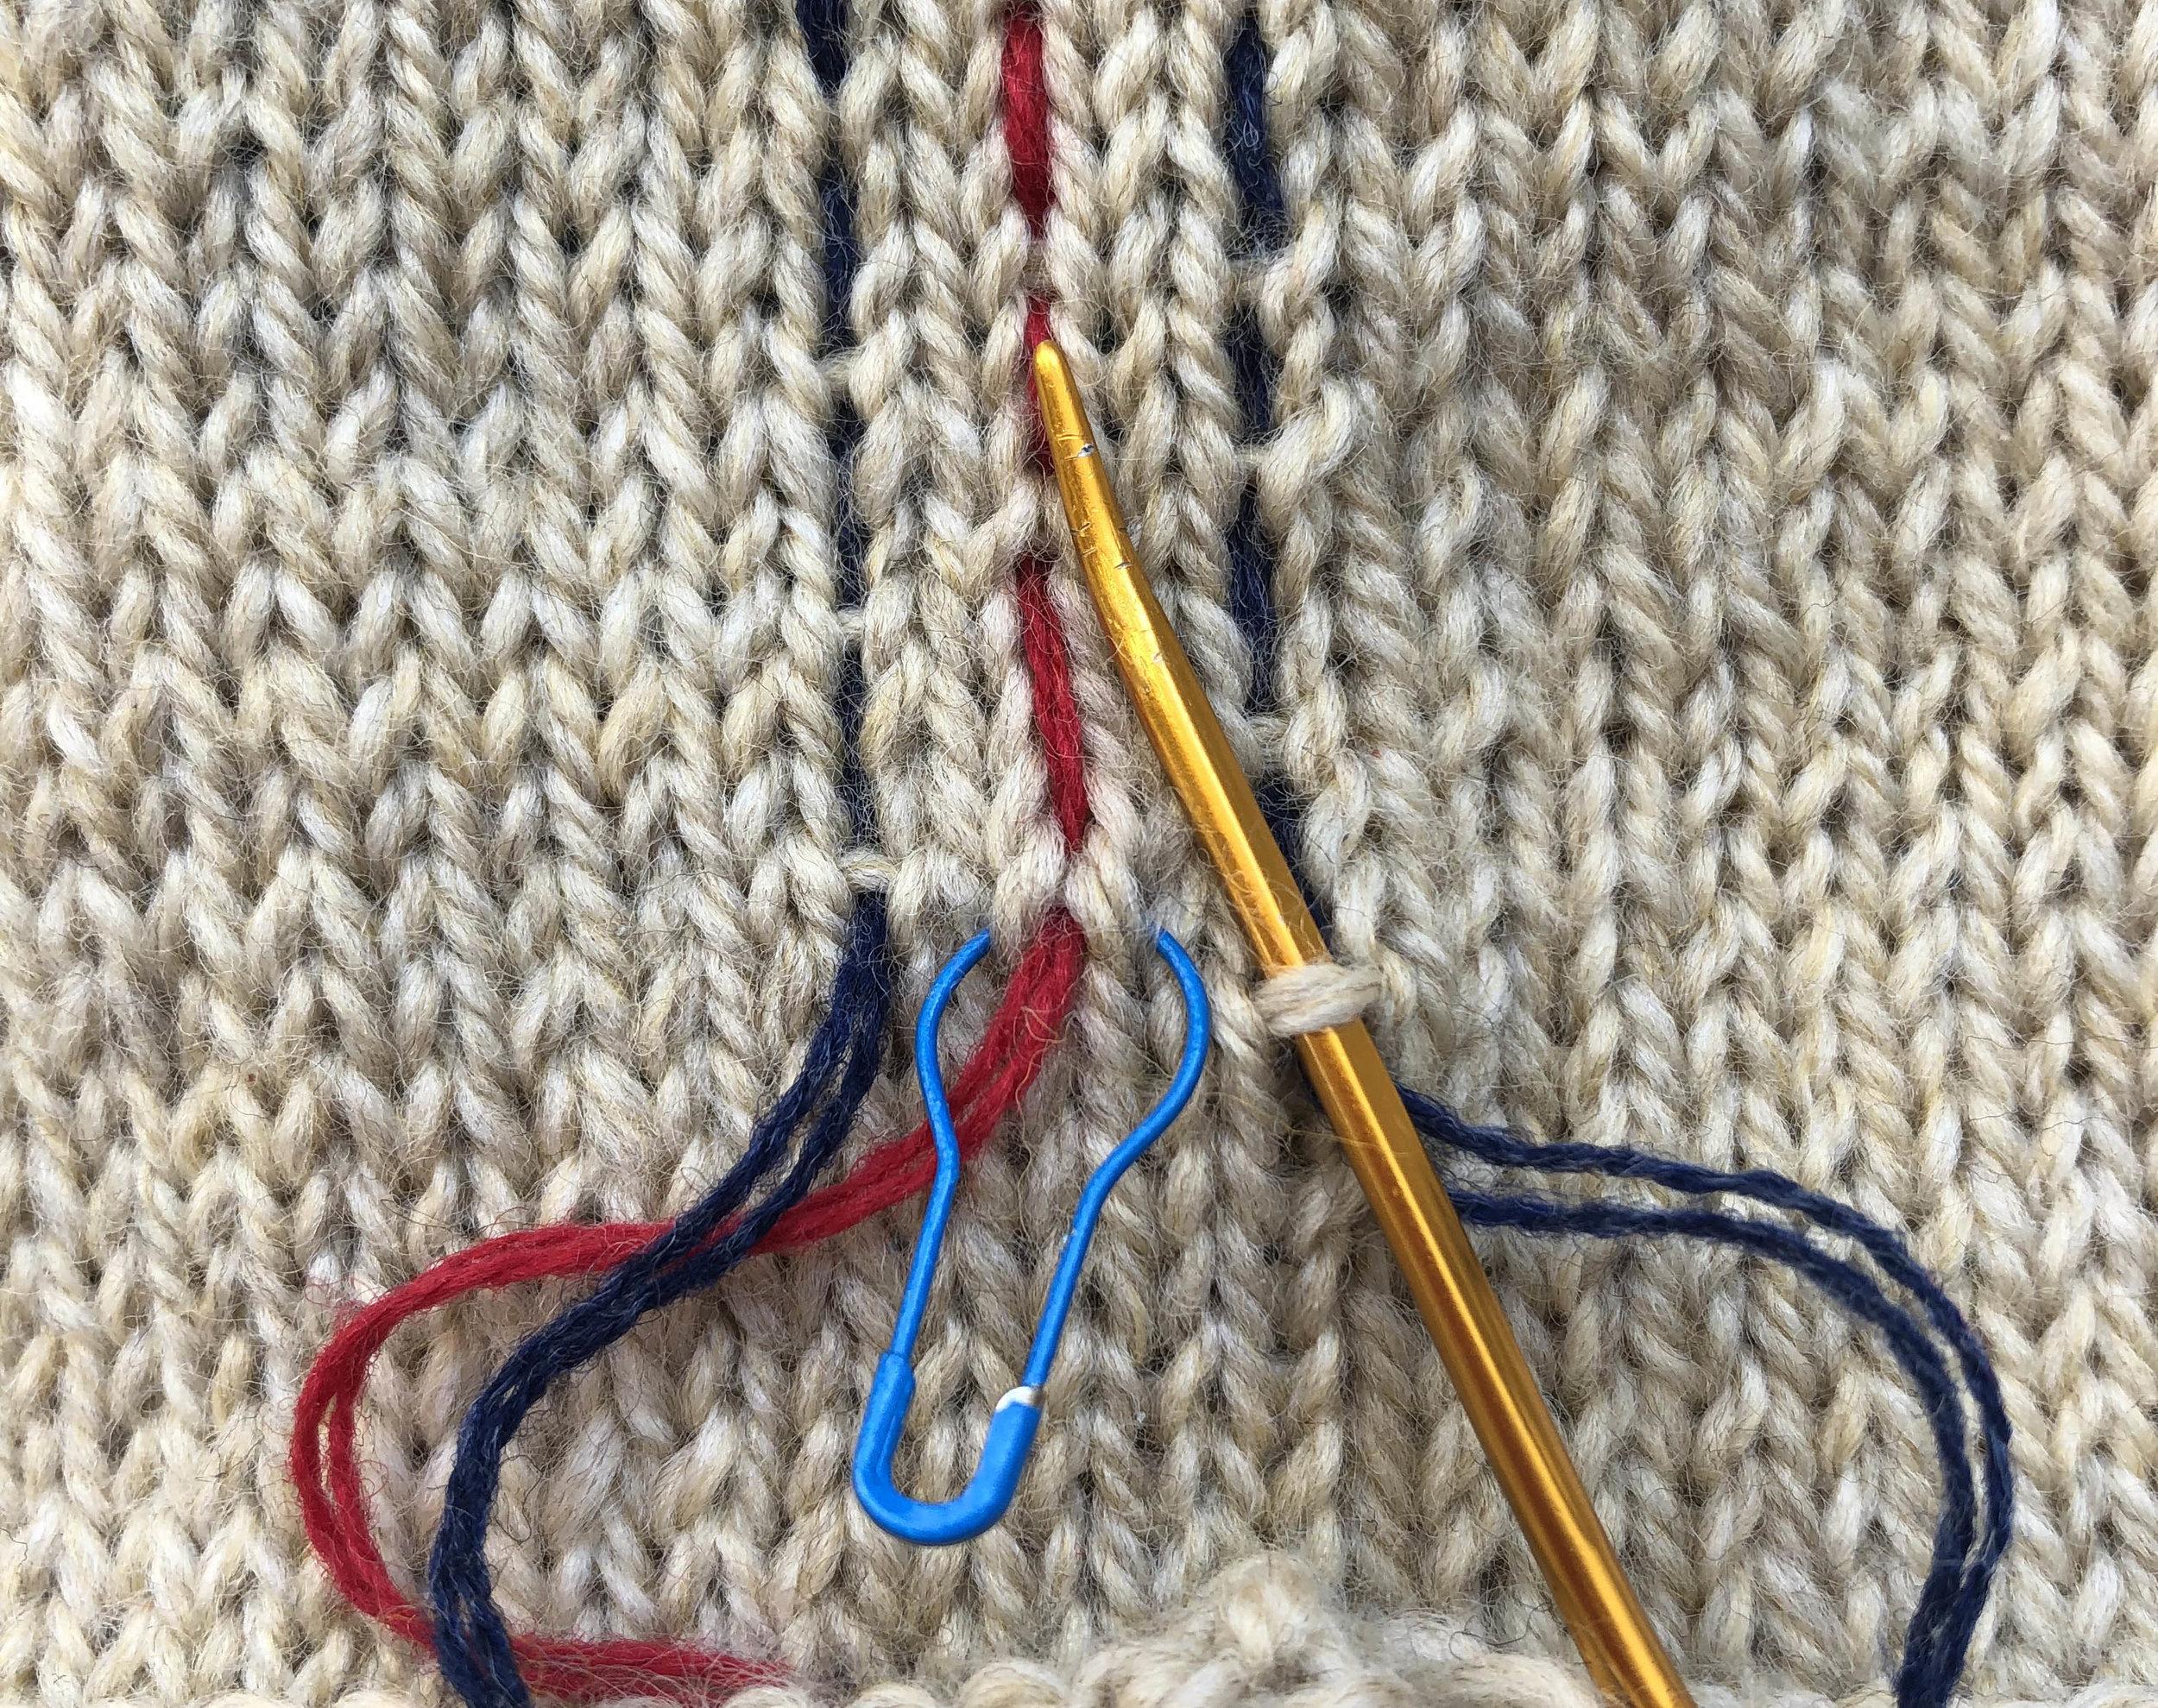 merele back stitch steek 2.jpg